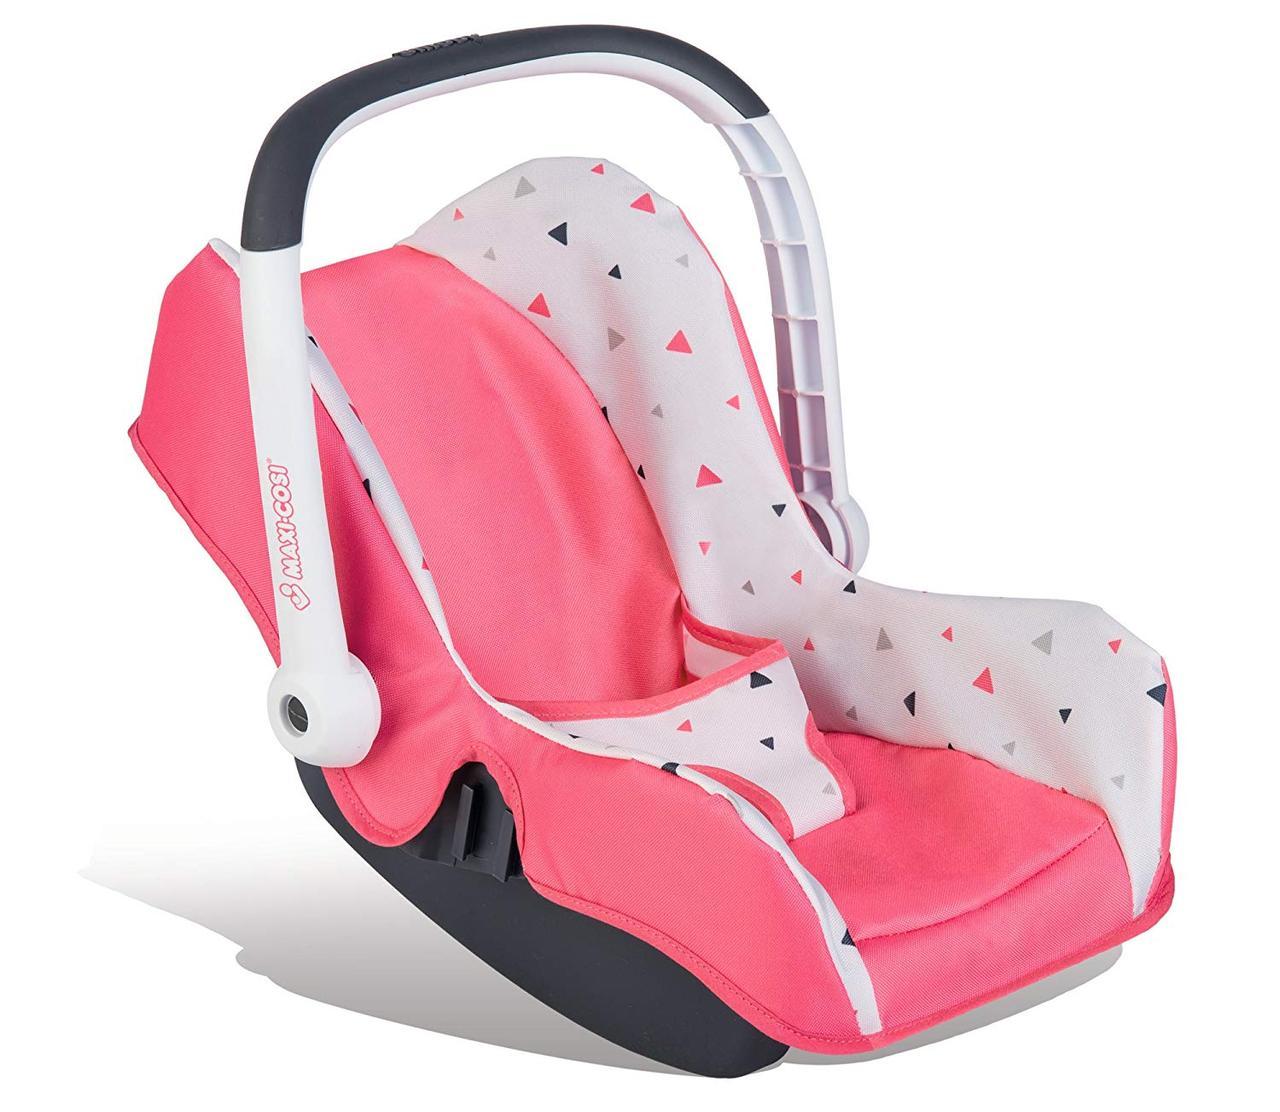 Крісло переноска для ляльки пупса Maxi-Cosi Quinny Smoby 240228